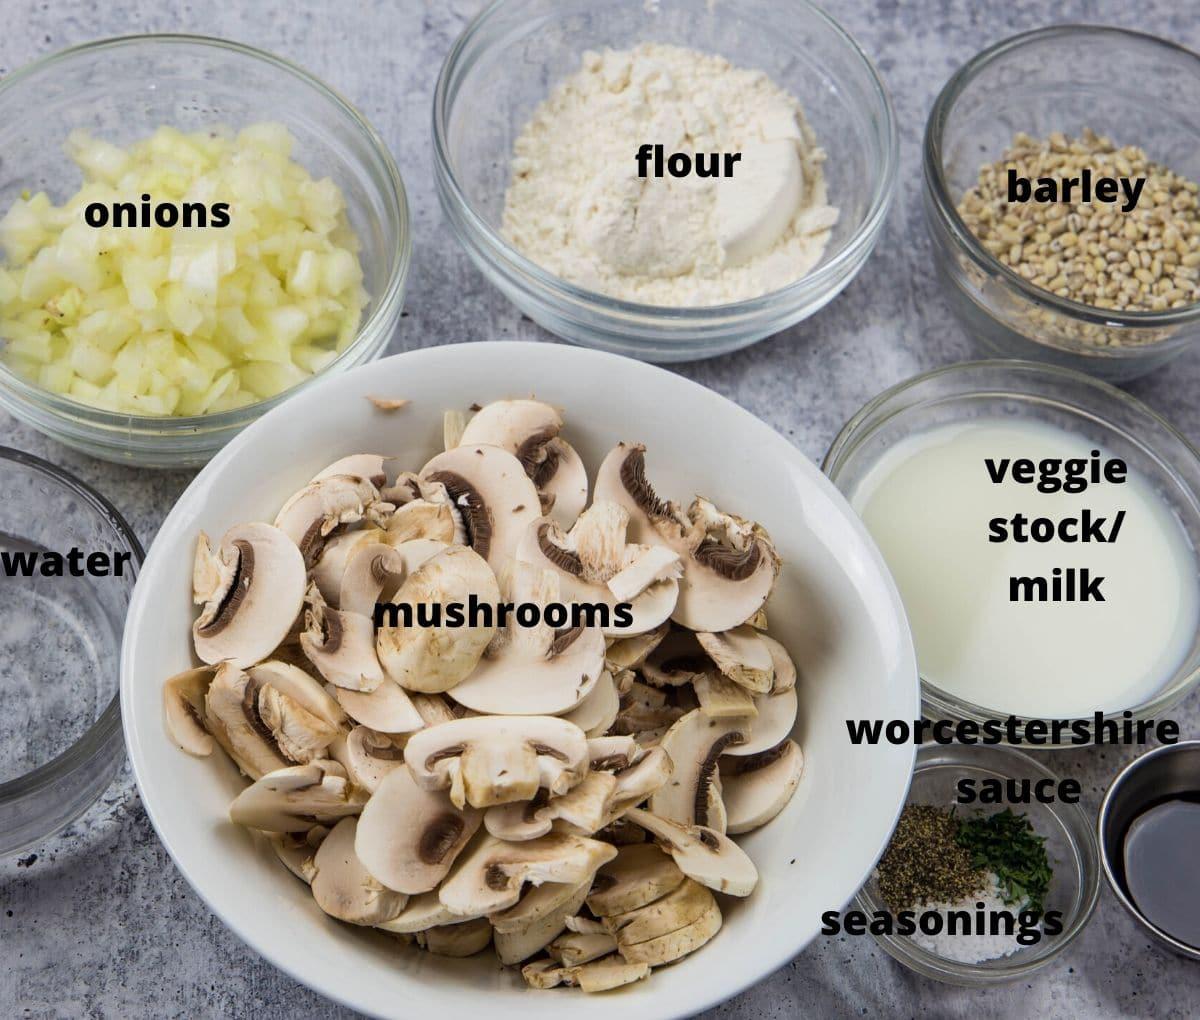 ingredients: mushrooms, onions, flour, barley, liquids, and seaassooning to make mushroom barley soup.